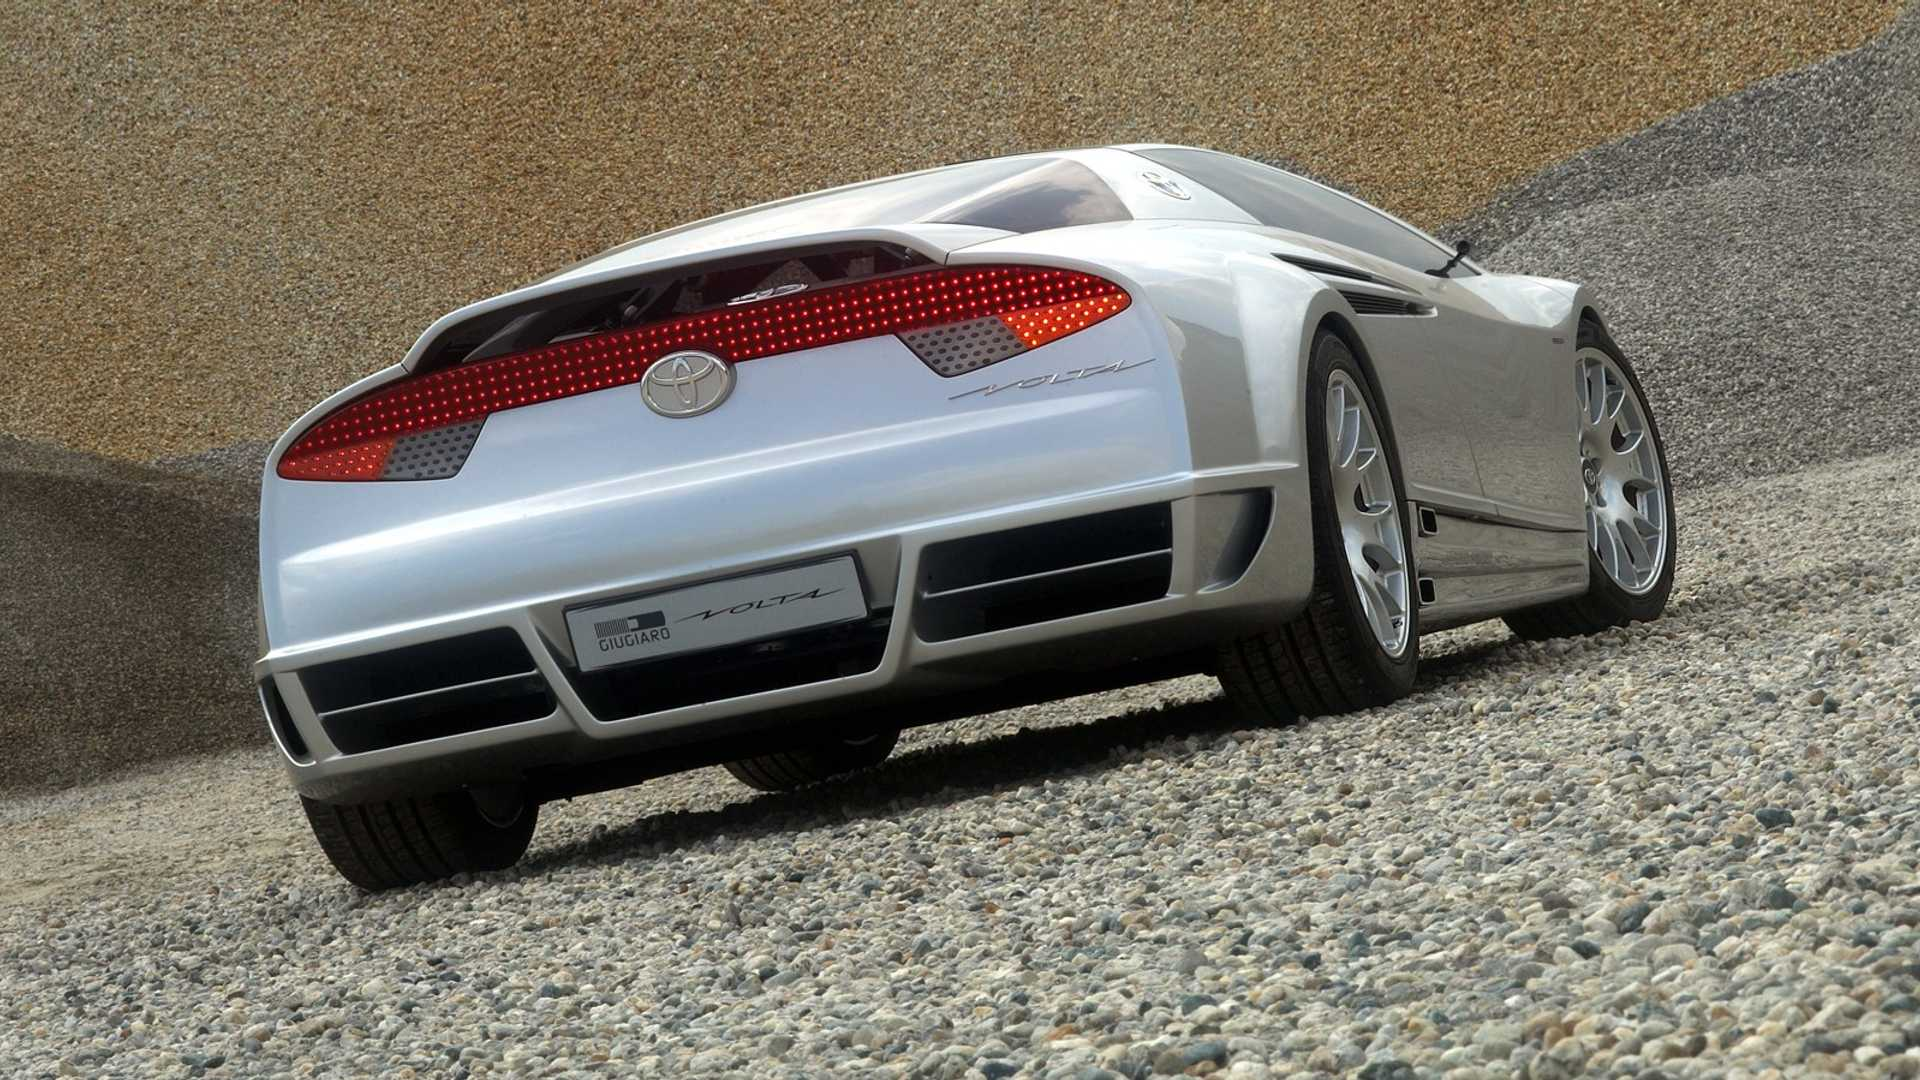 Toyota-Alessandro-Volta-concept-2004-20